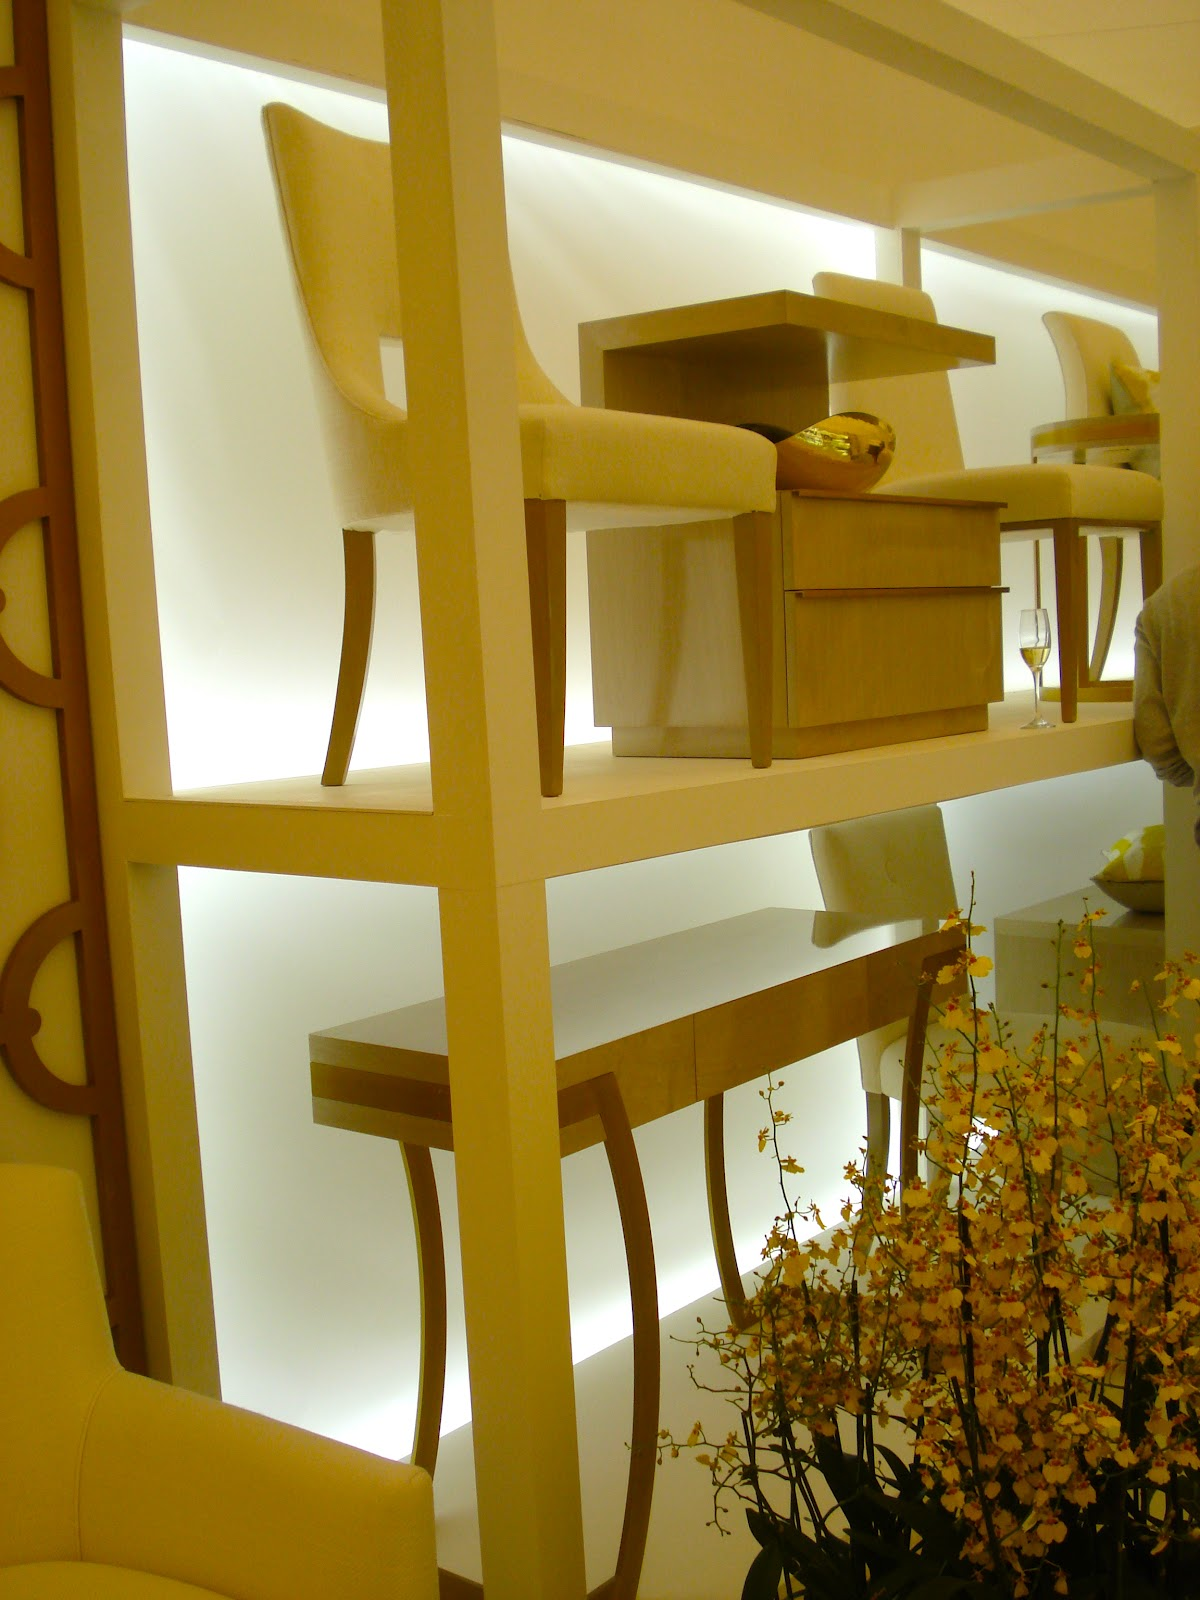 Alexandra d foster destinations perfected london for Interior design lighting specialist